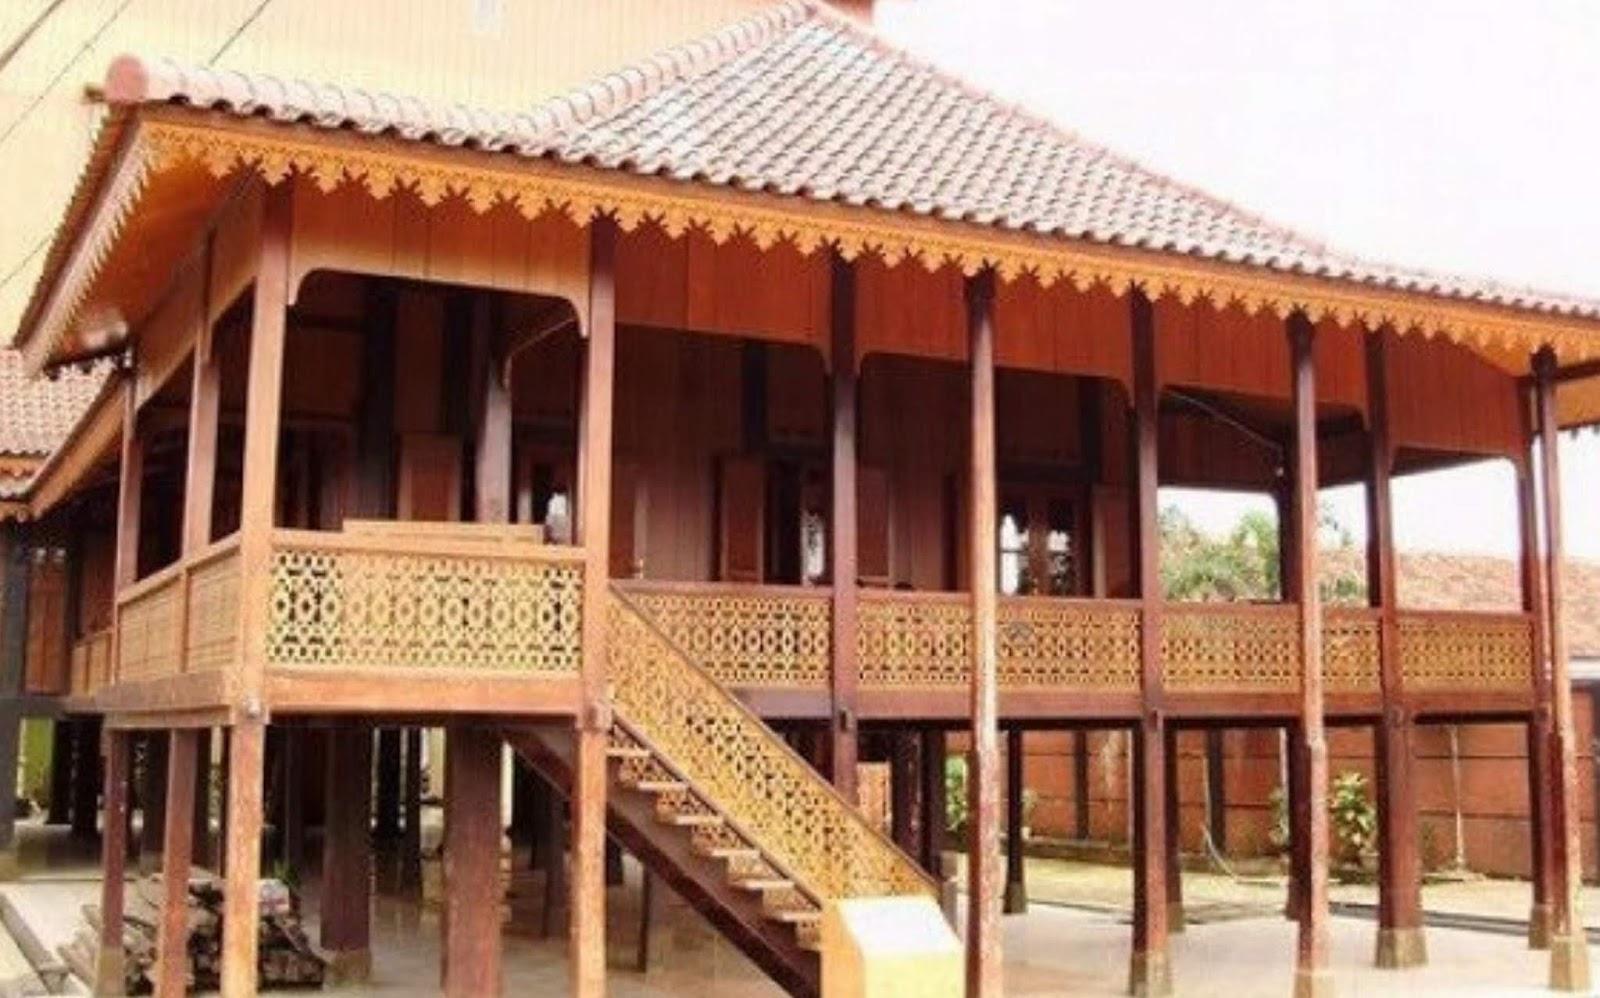 4 Rumah Adat Lampung Berikut Gambar Serta Penjelasannya Cindri Yanto